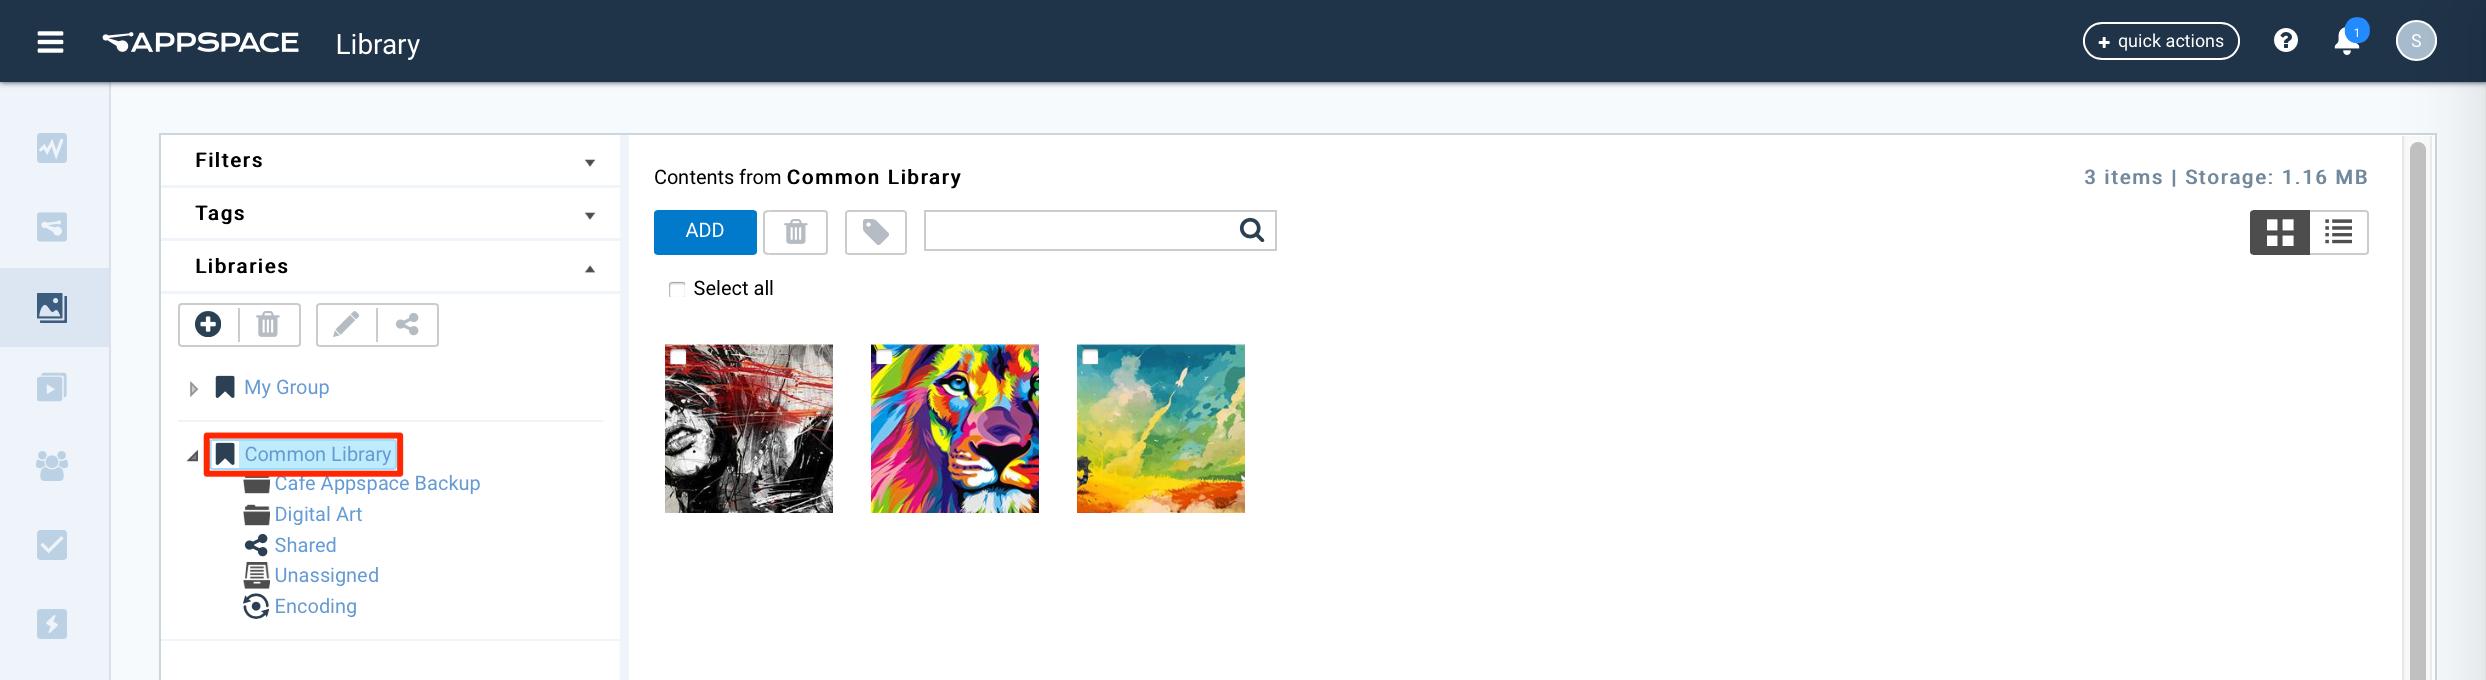 Widget: Weather — Appspace v7 0 Documentation